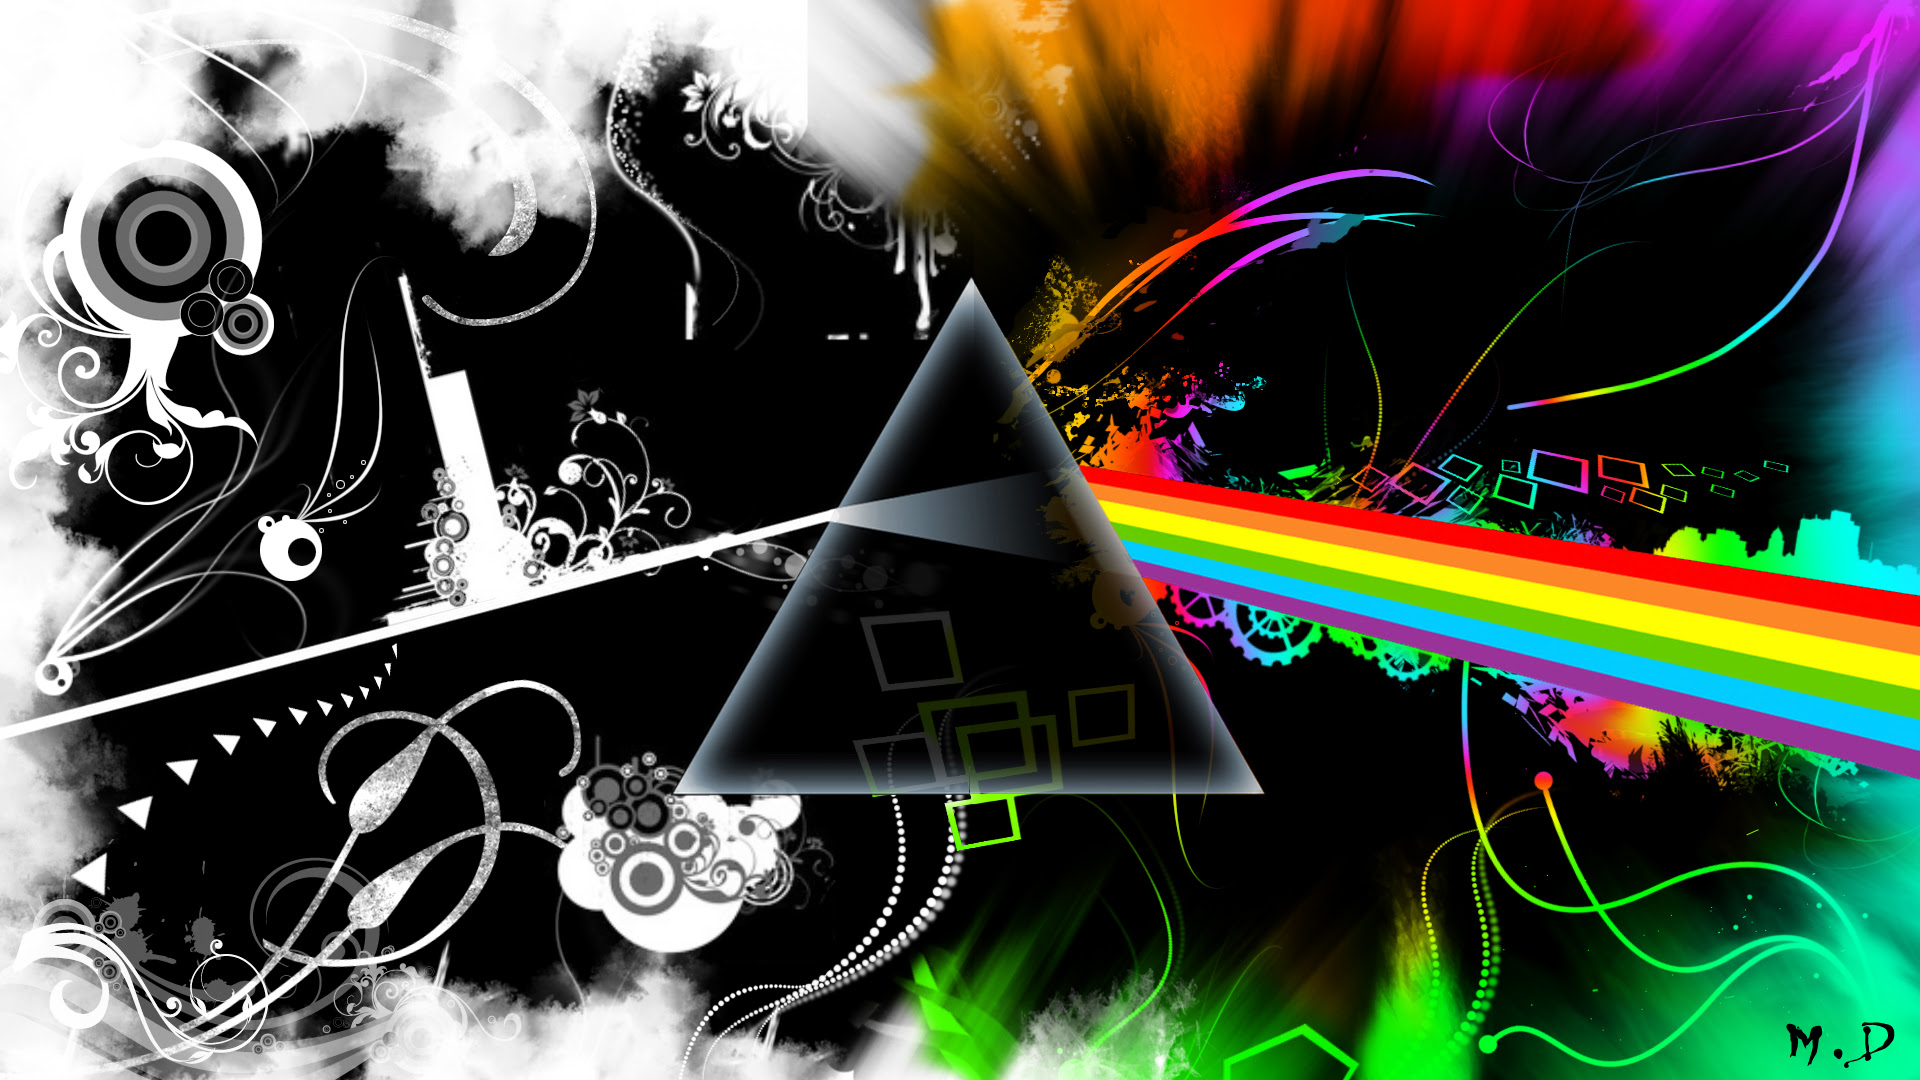 Pink Floyd Wallpaper 1920x1080 54927